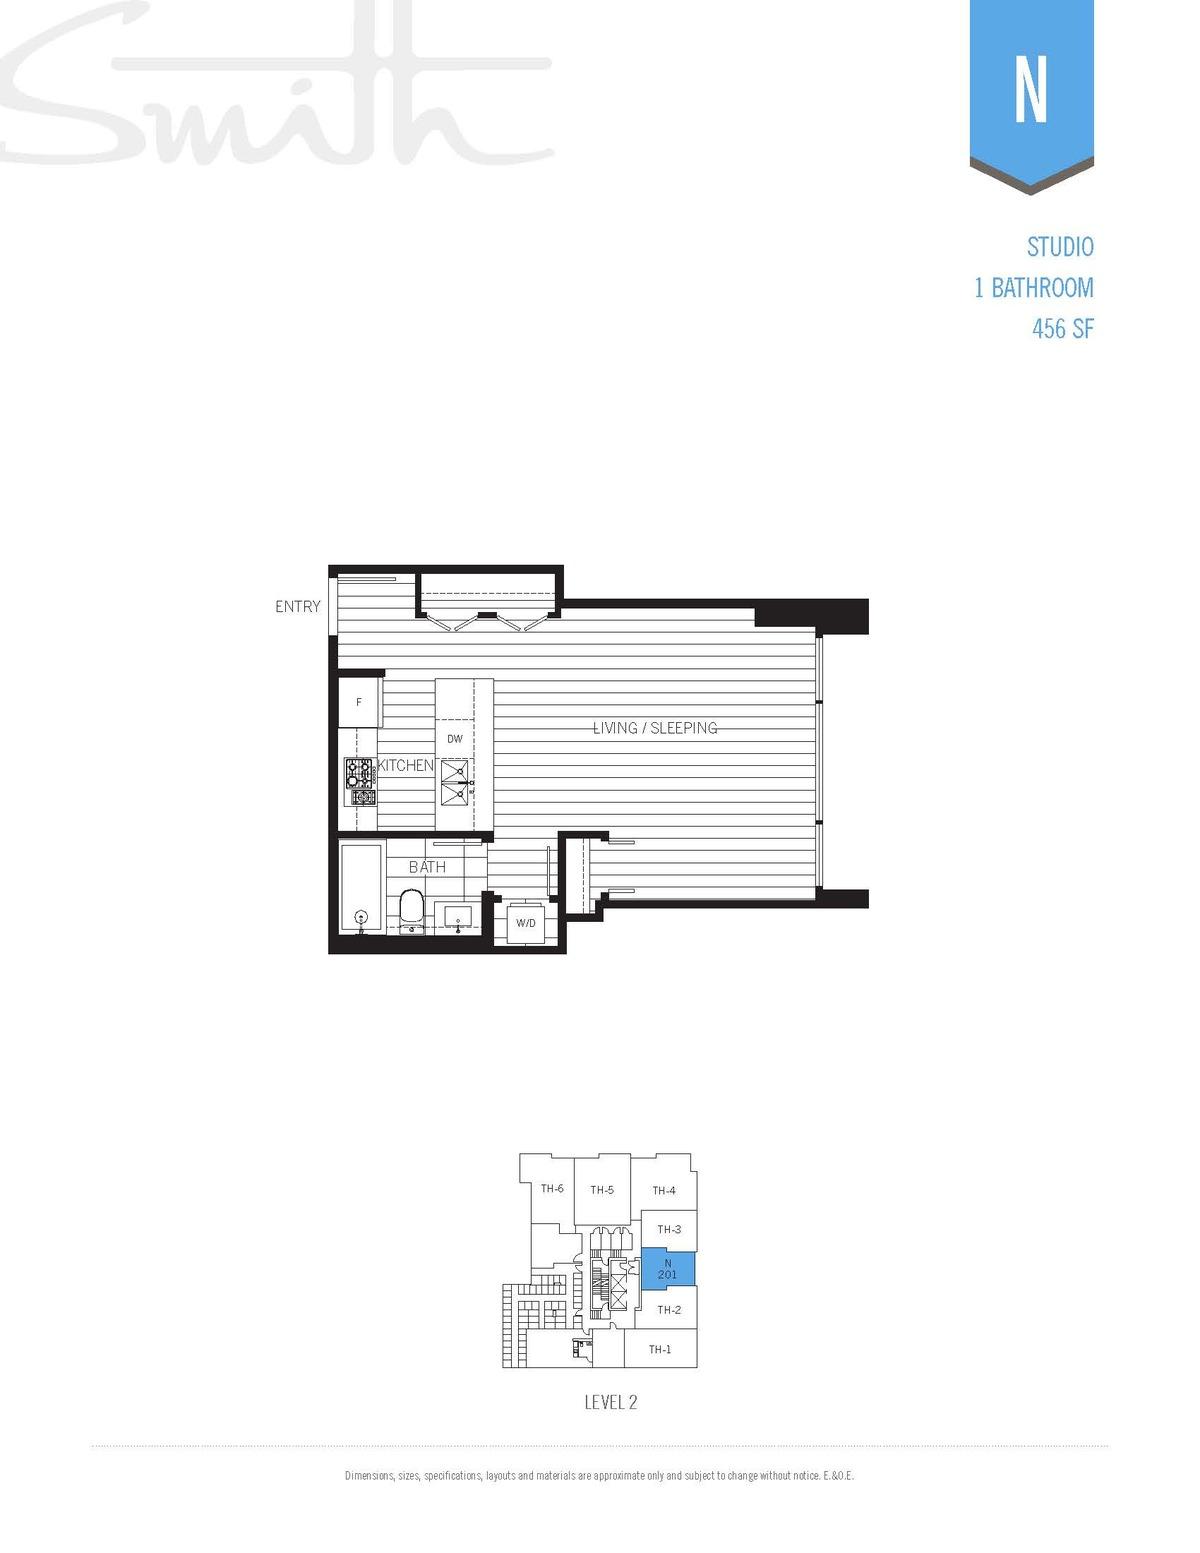 Smith Floorplan N